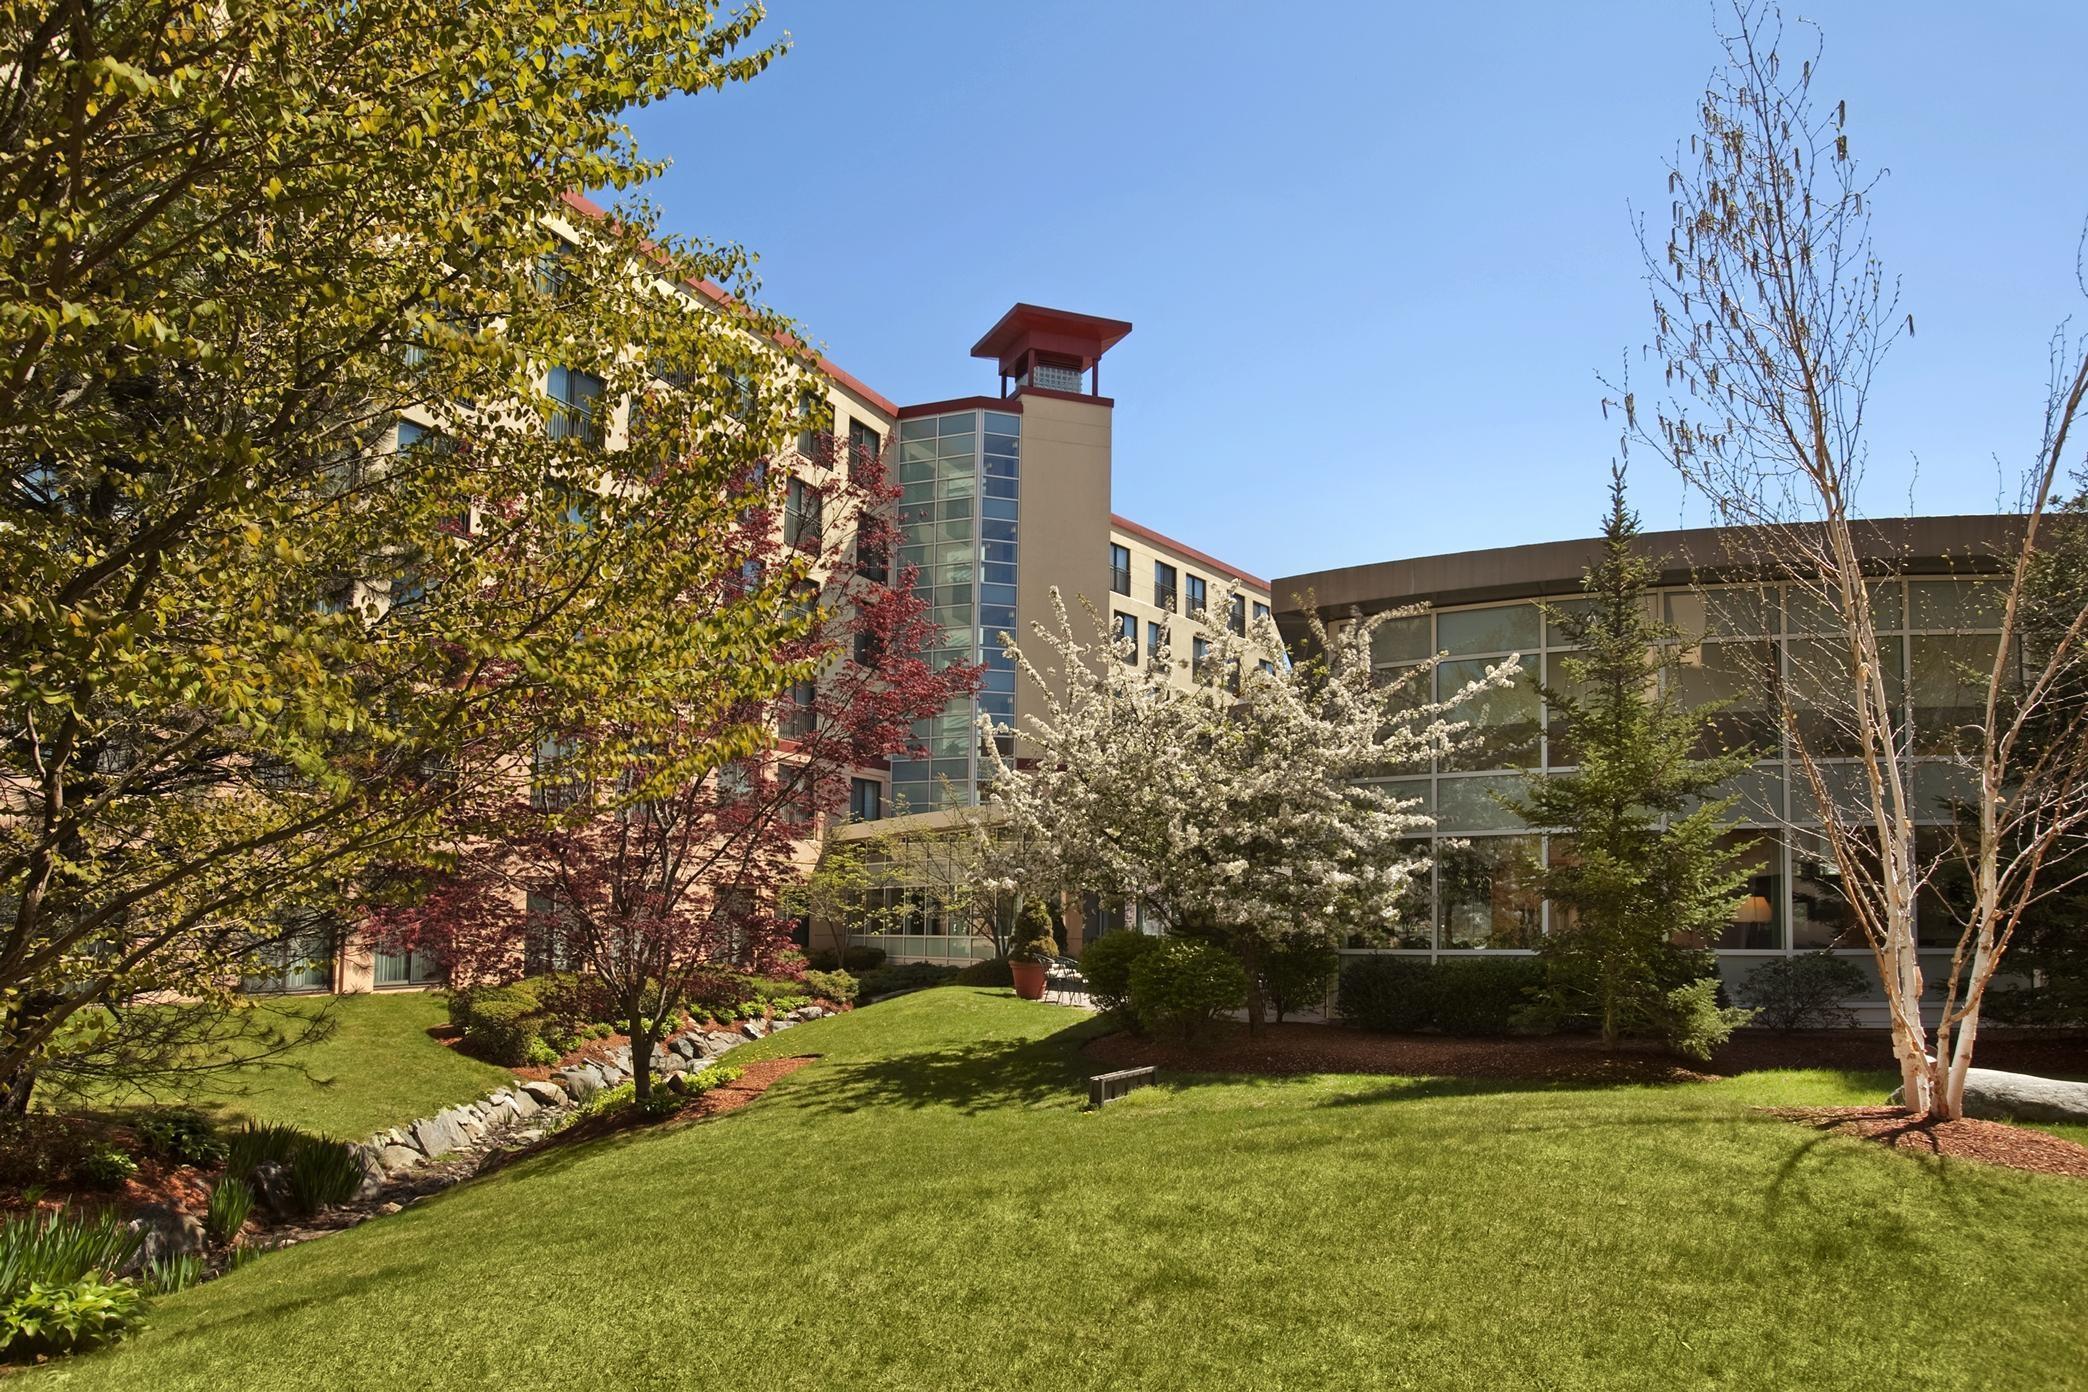 Embassy Suites By Hilton Boston Marlborough In Marlborough